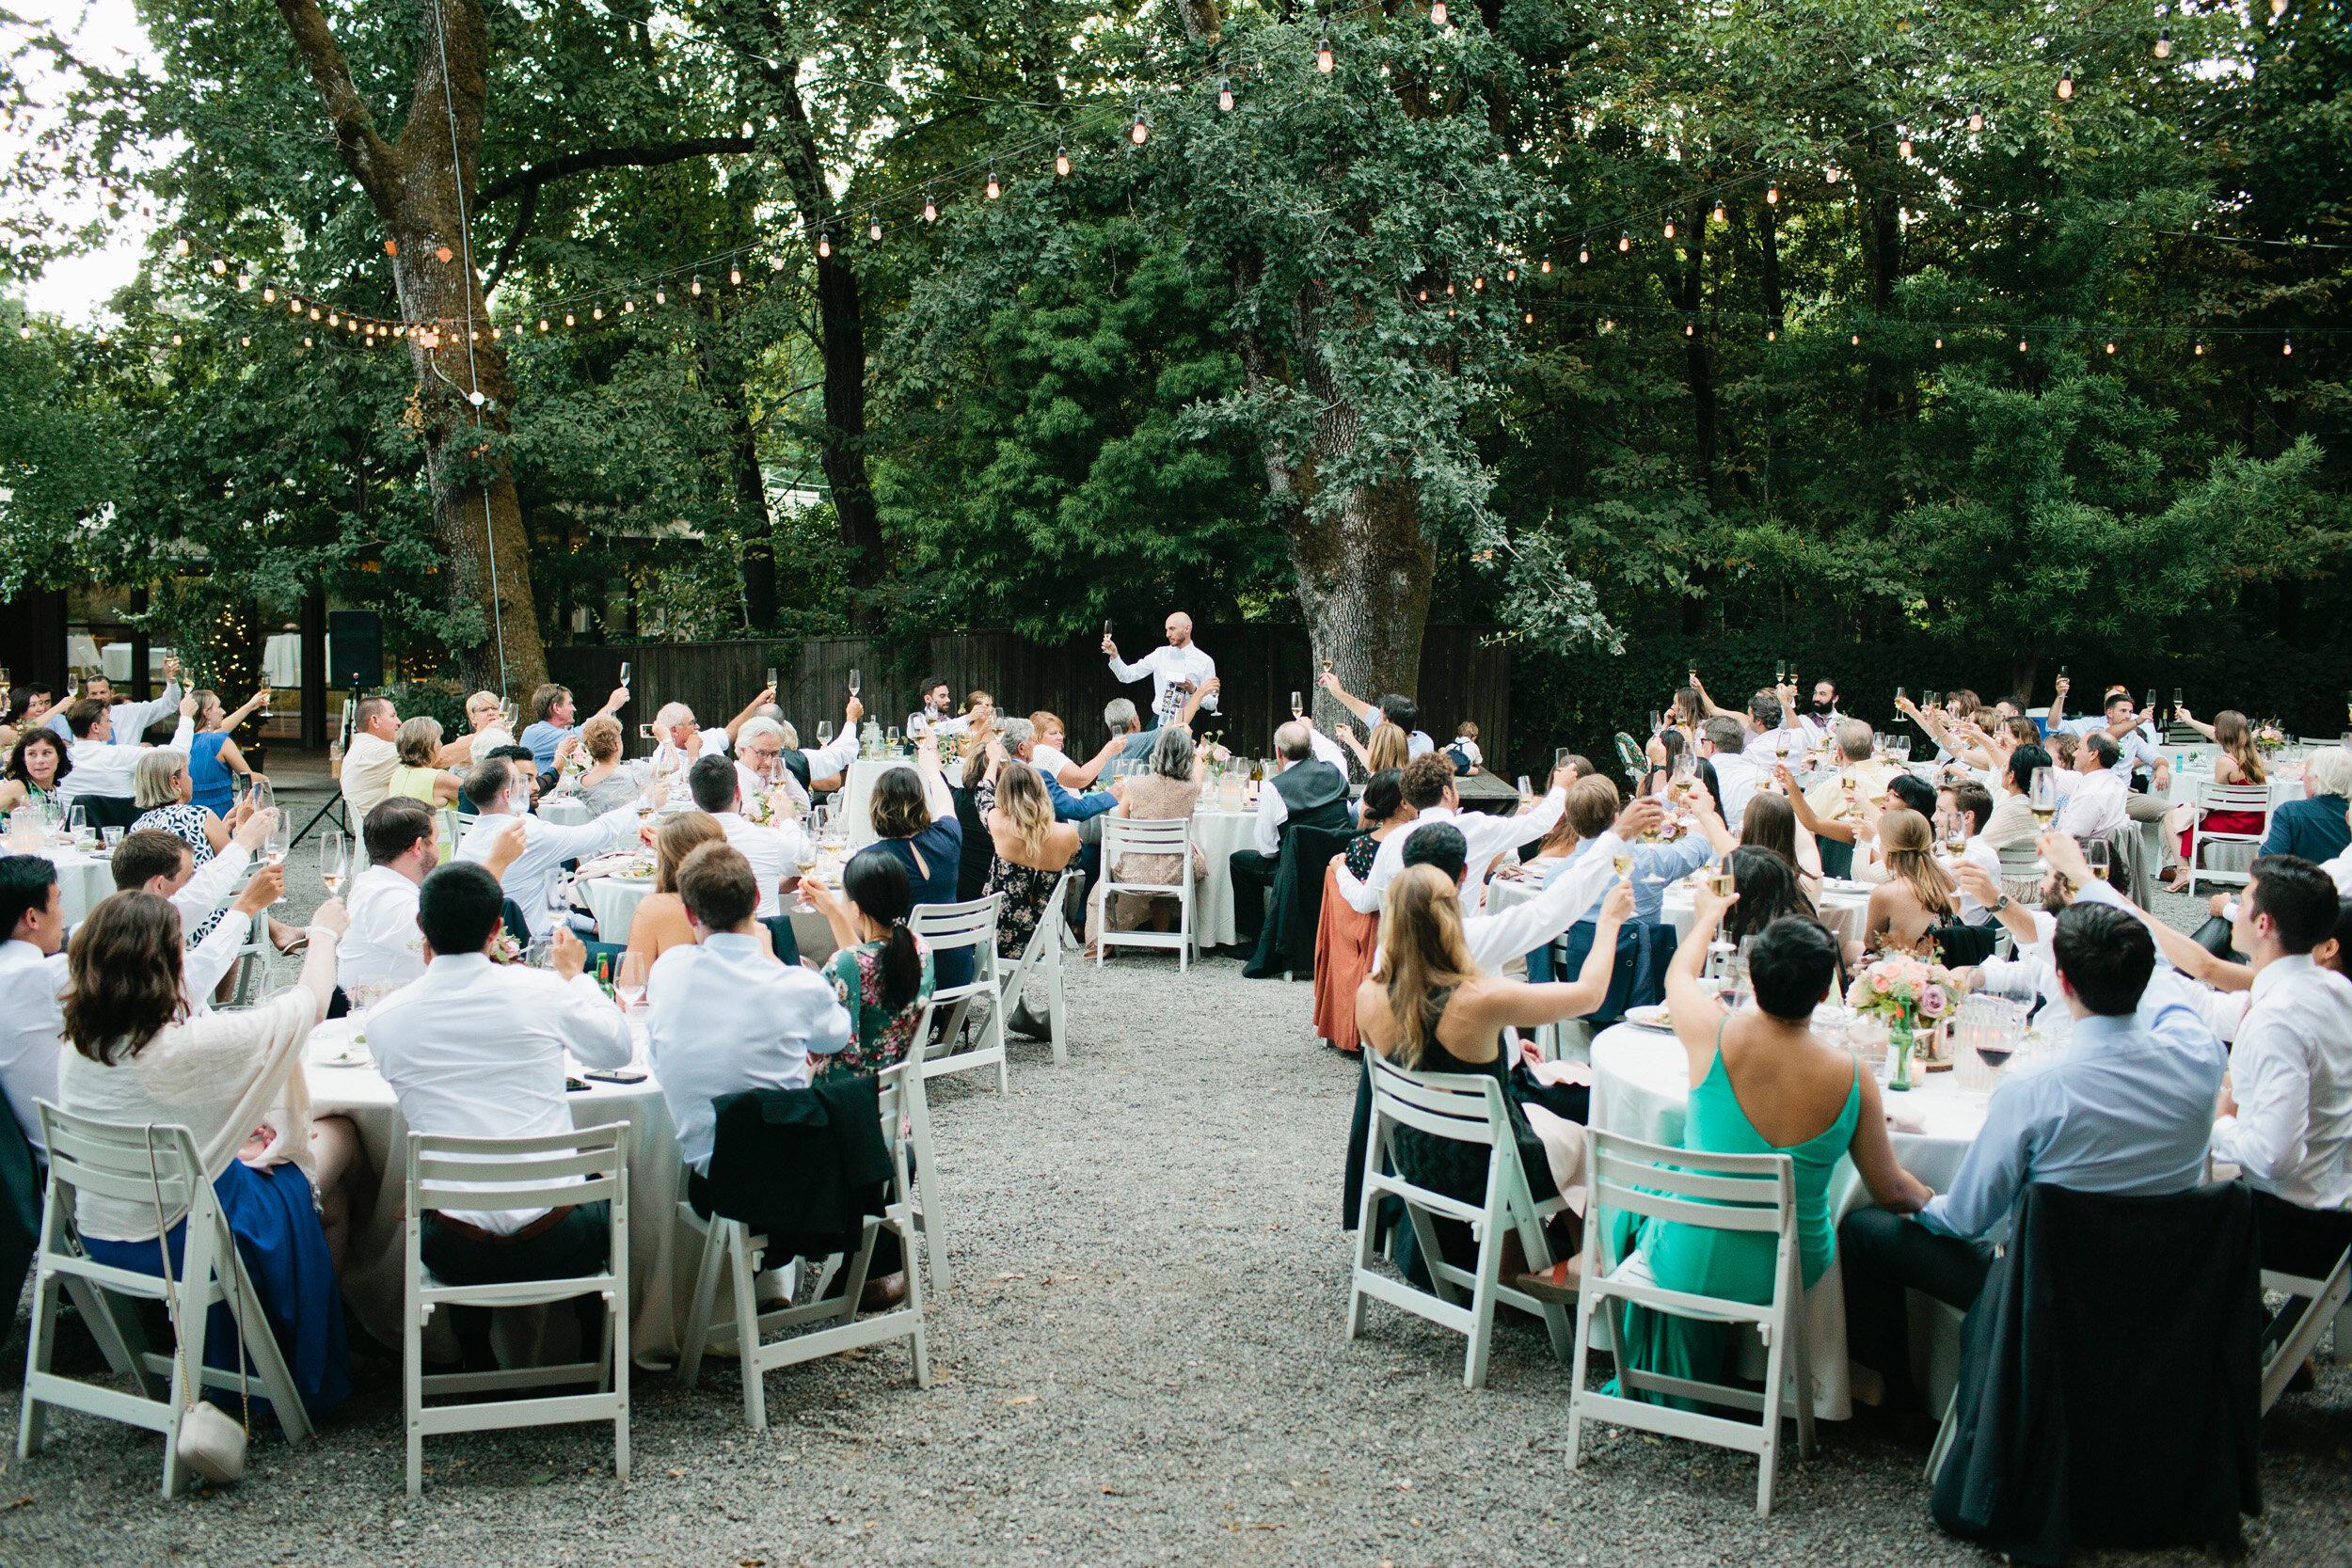 Marin-Art-Garden-Center-Wedding-62.JPG